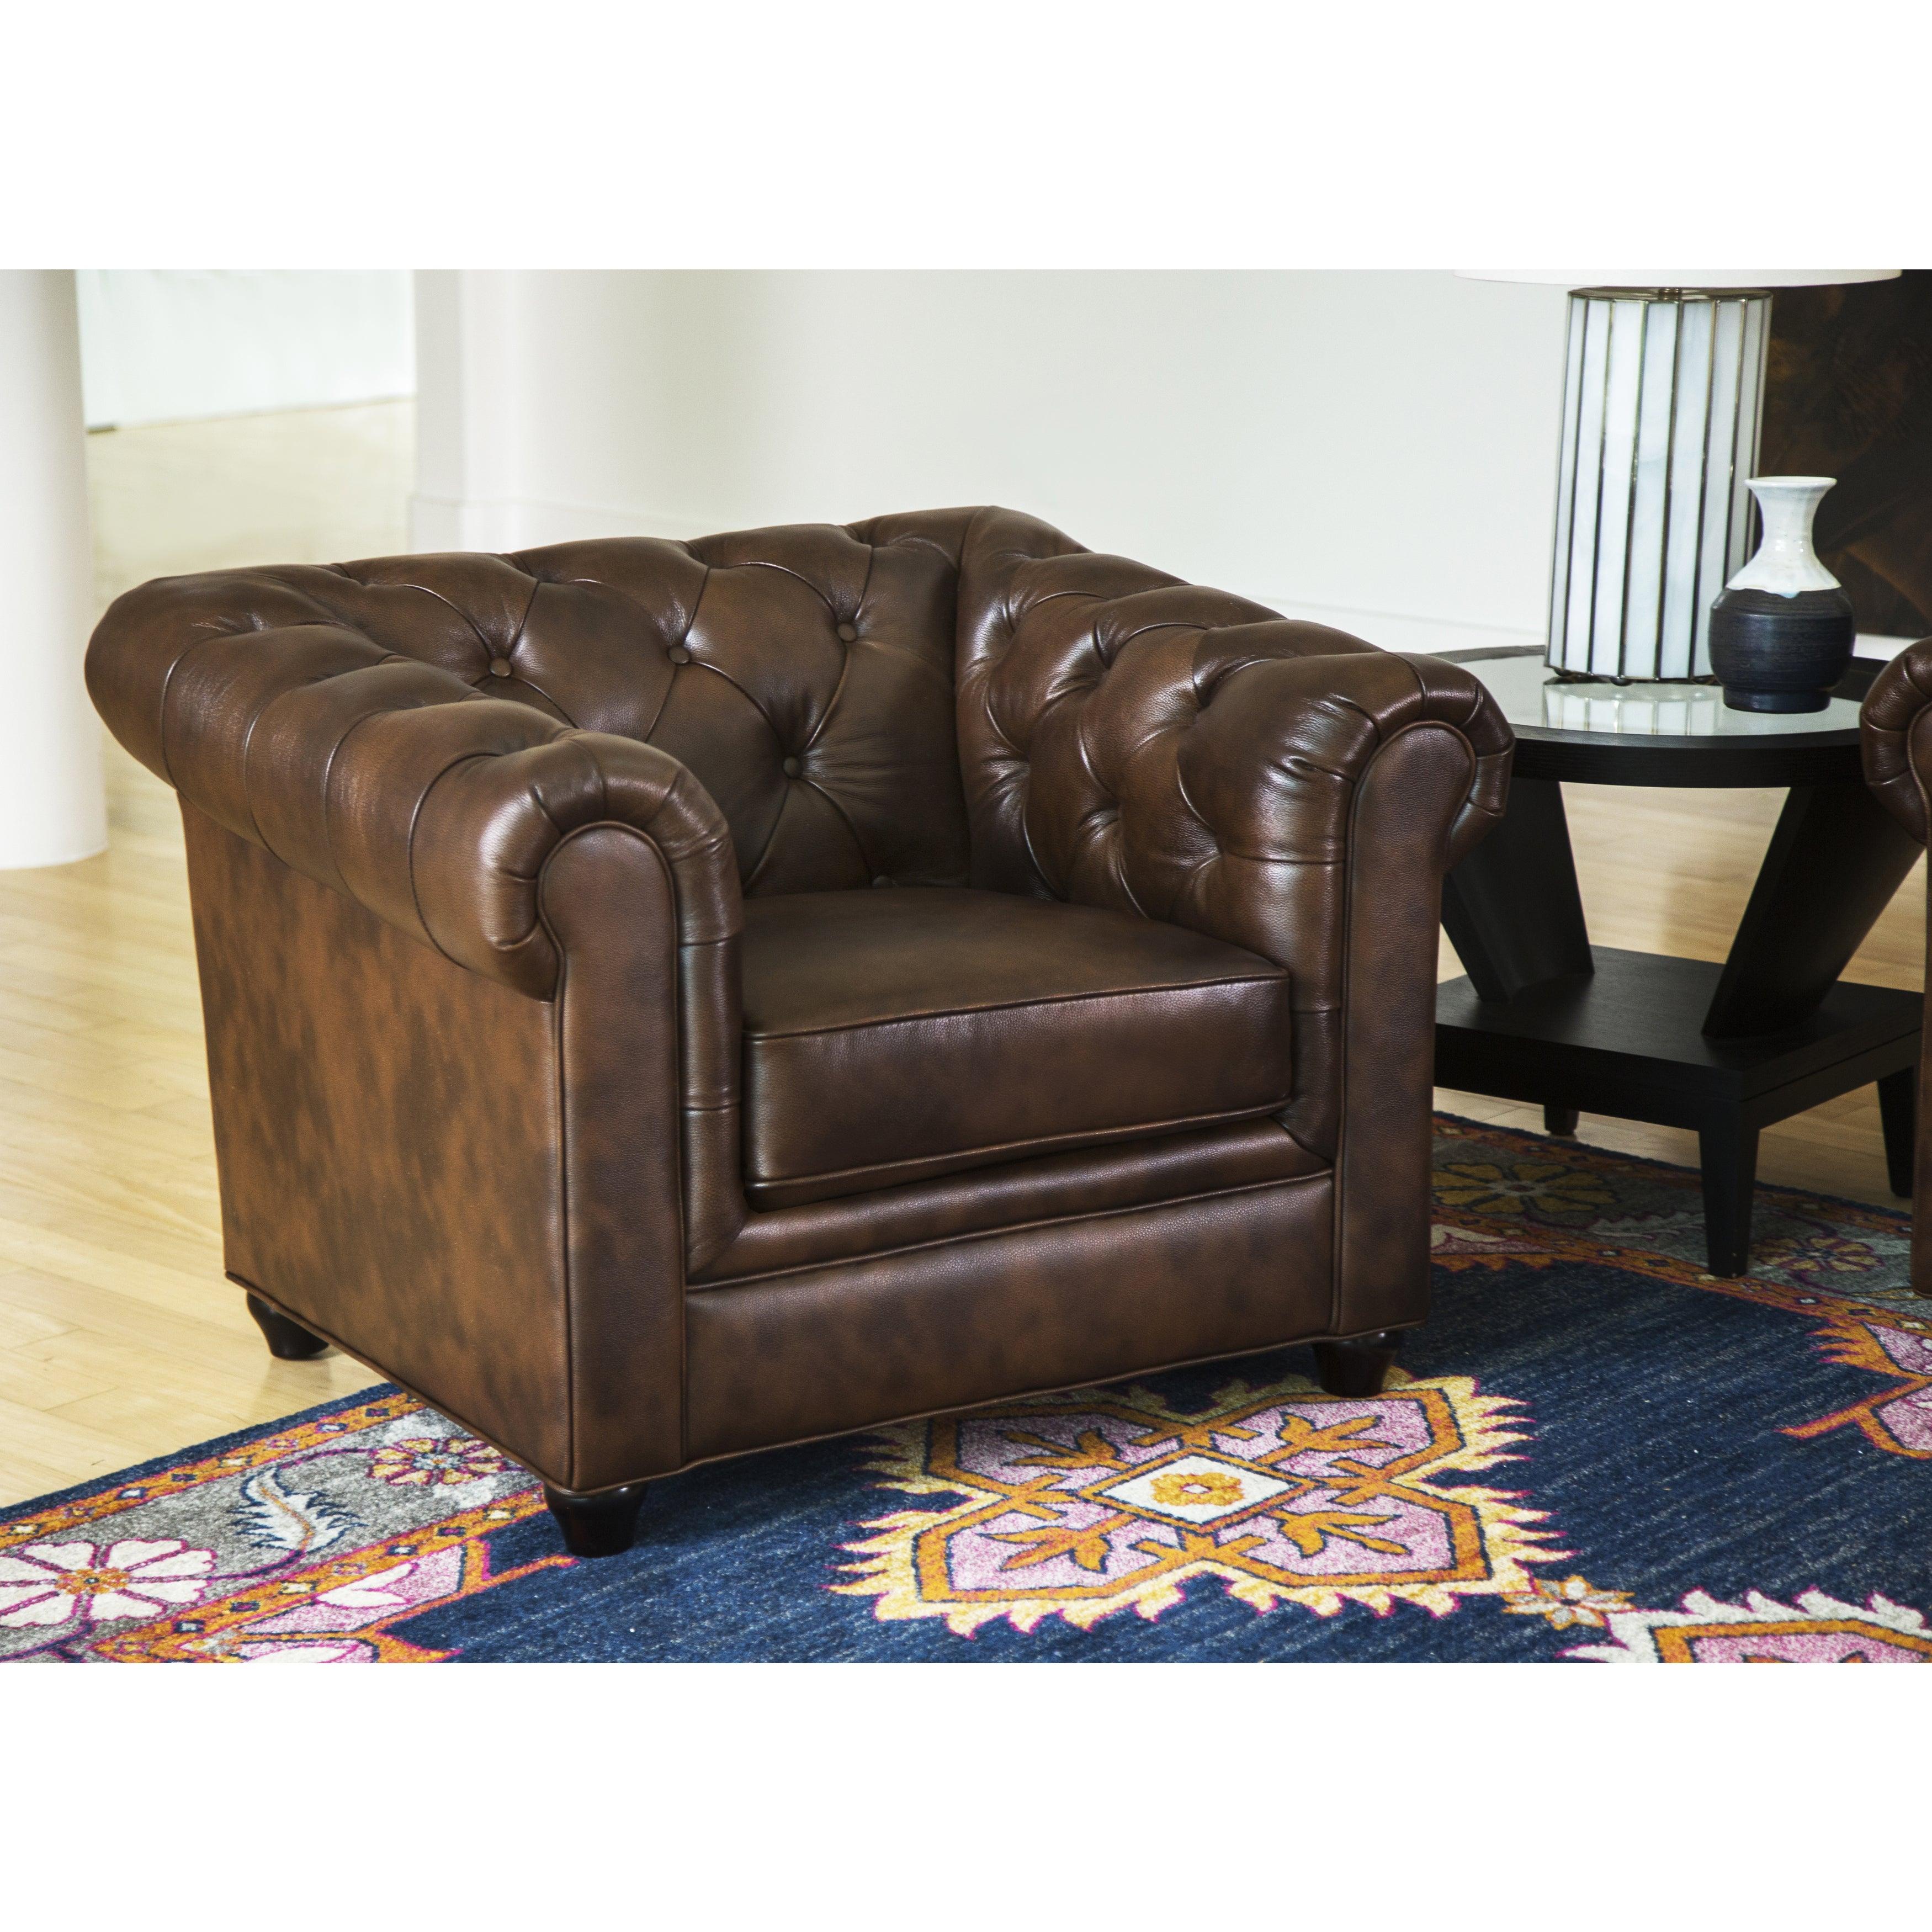 Abbyson Living Tuscan Leather Sofa